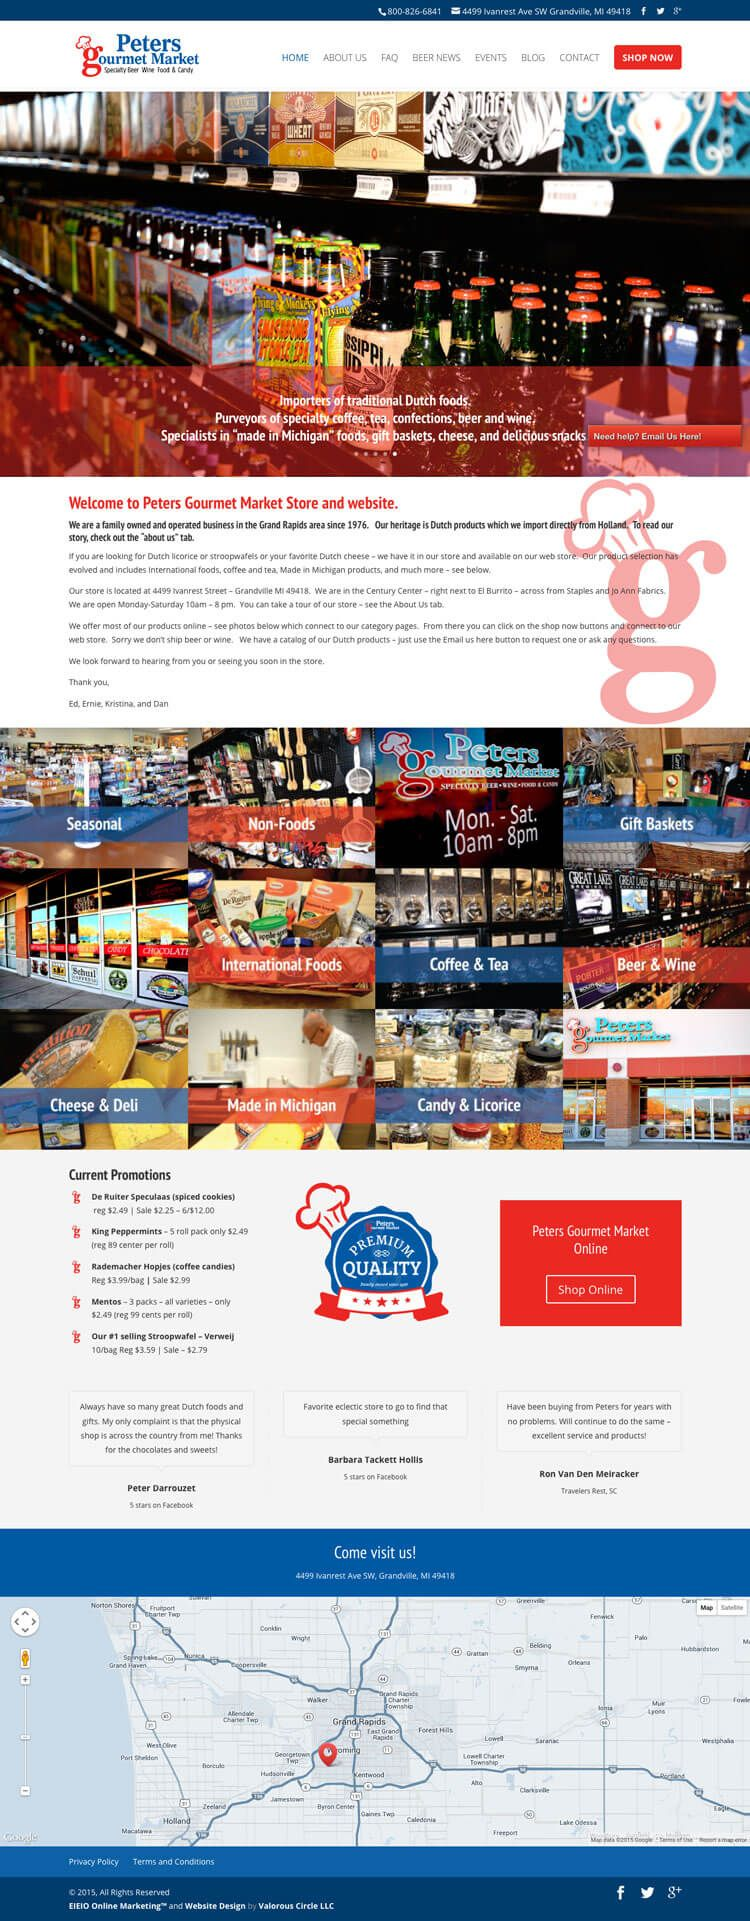 Grand Rapids Website Design for Peters Gourmet Market by